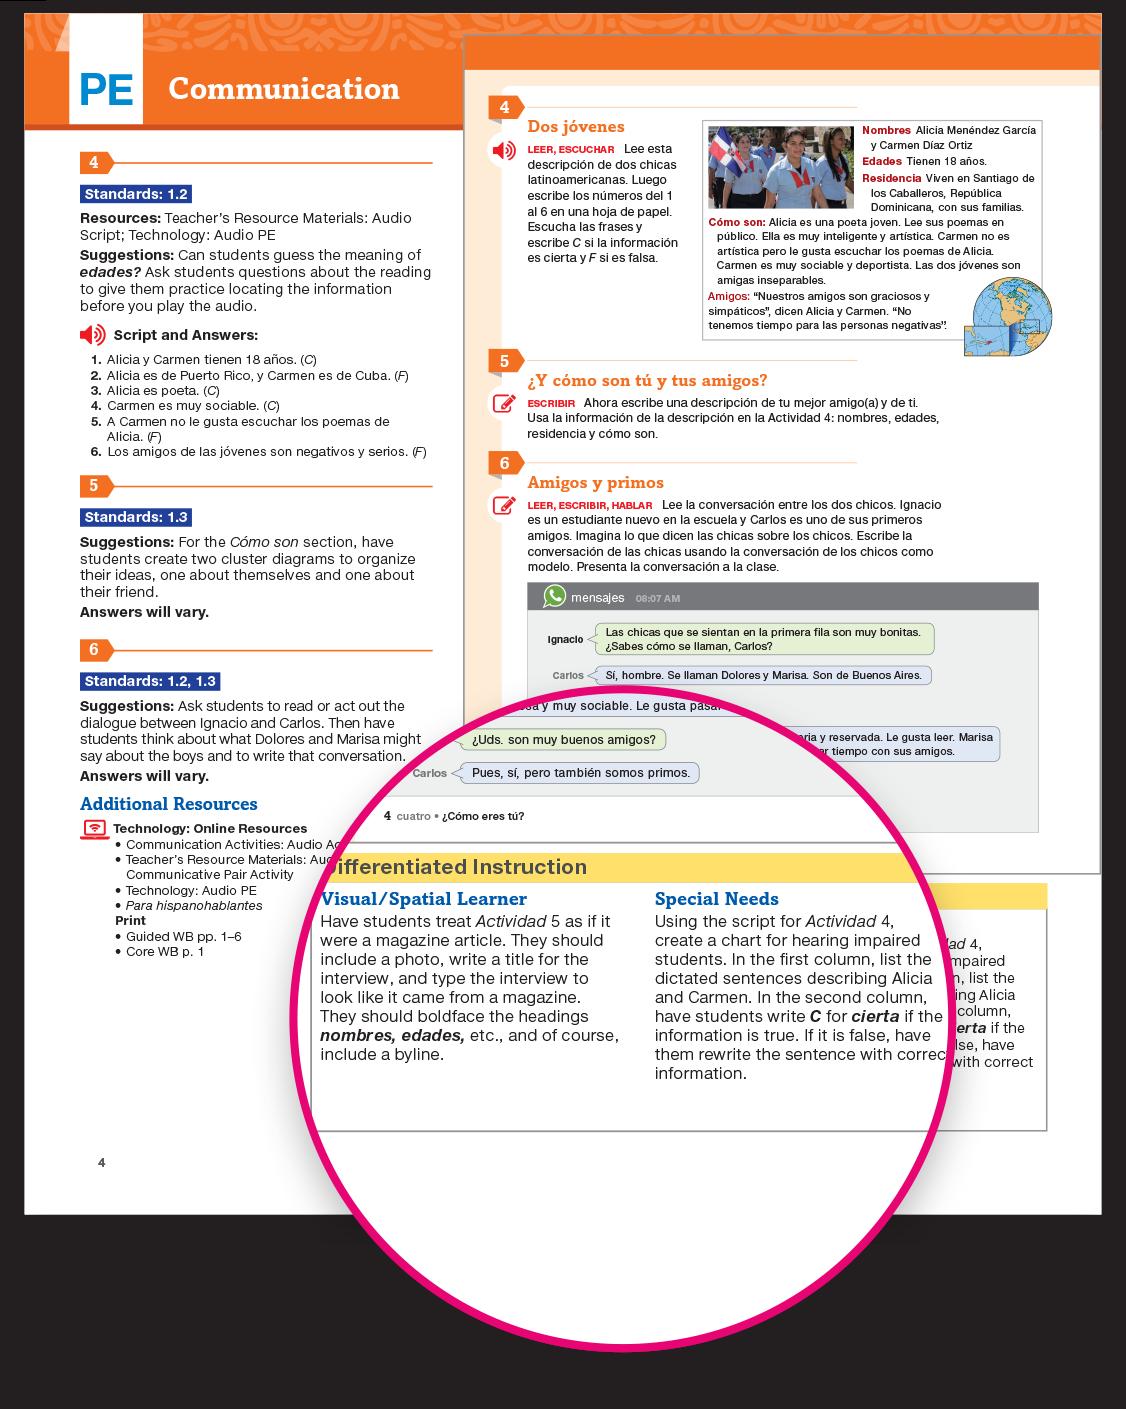 Auténtico Spanish Program | Pearson Middle and High School Spanish ...